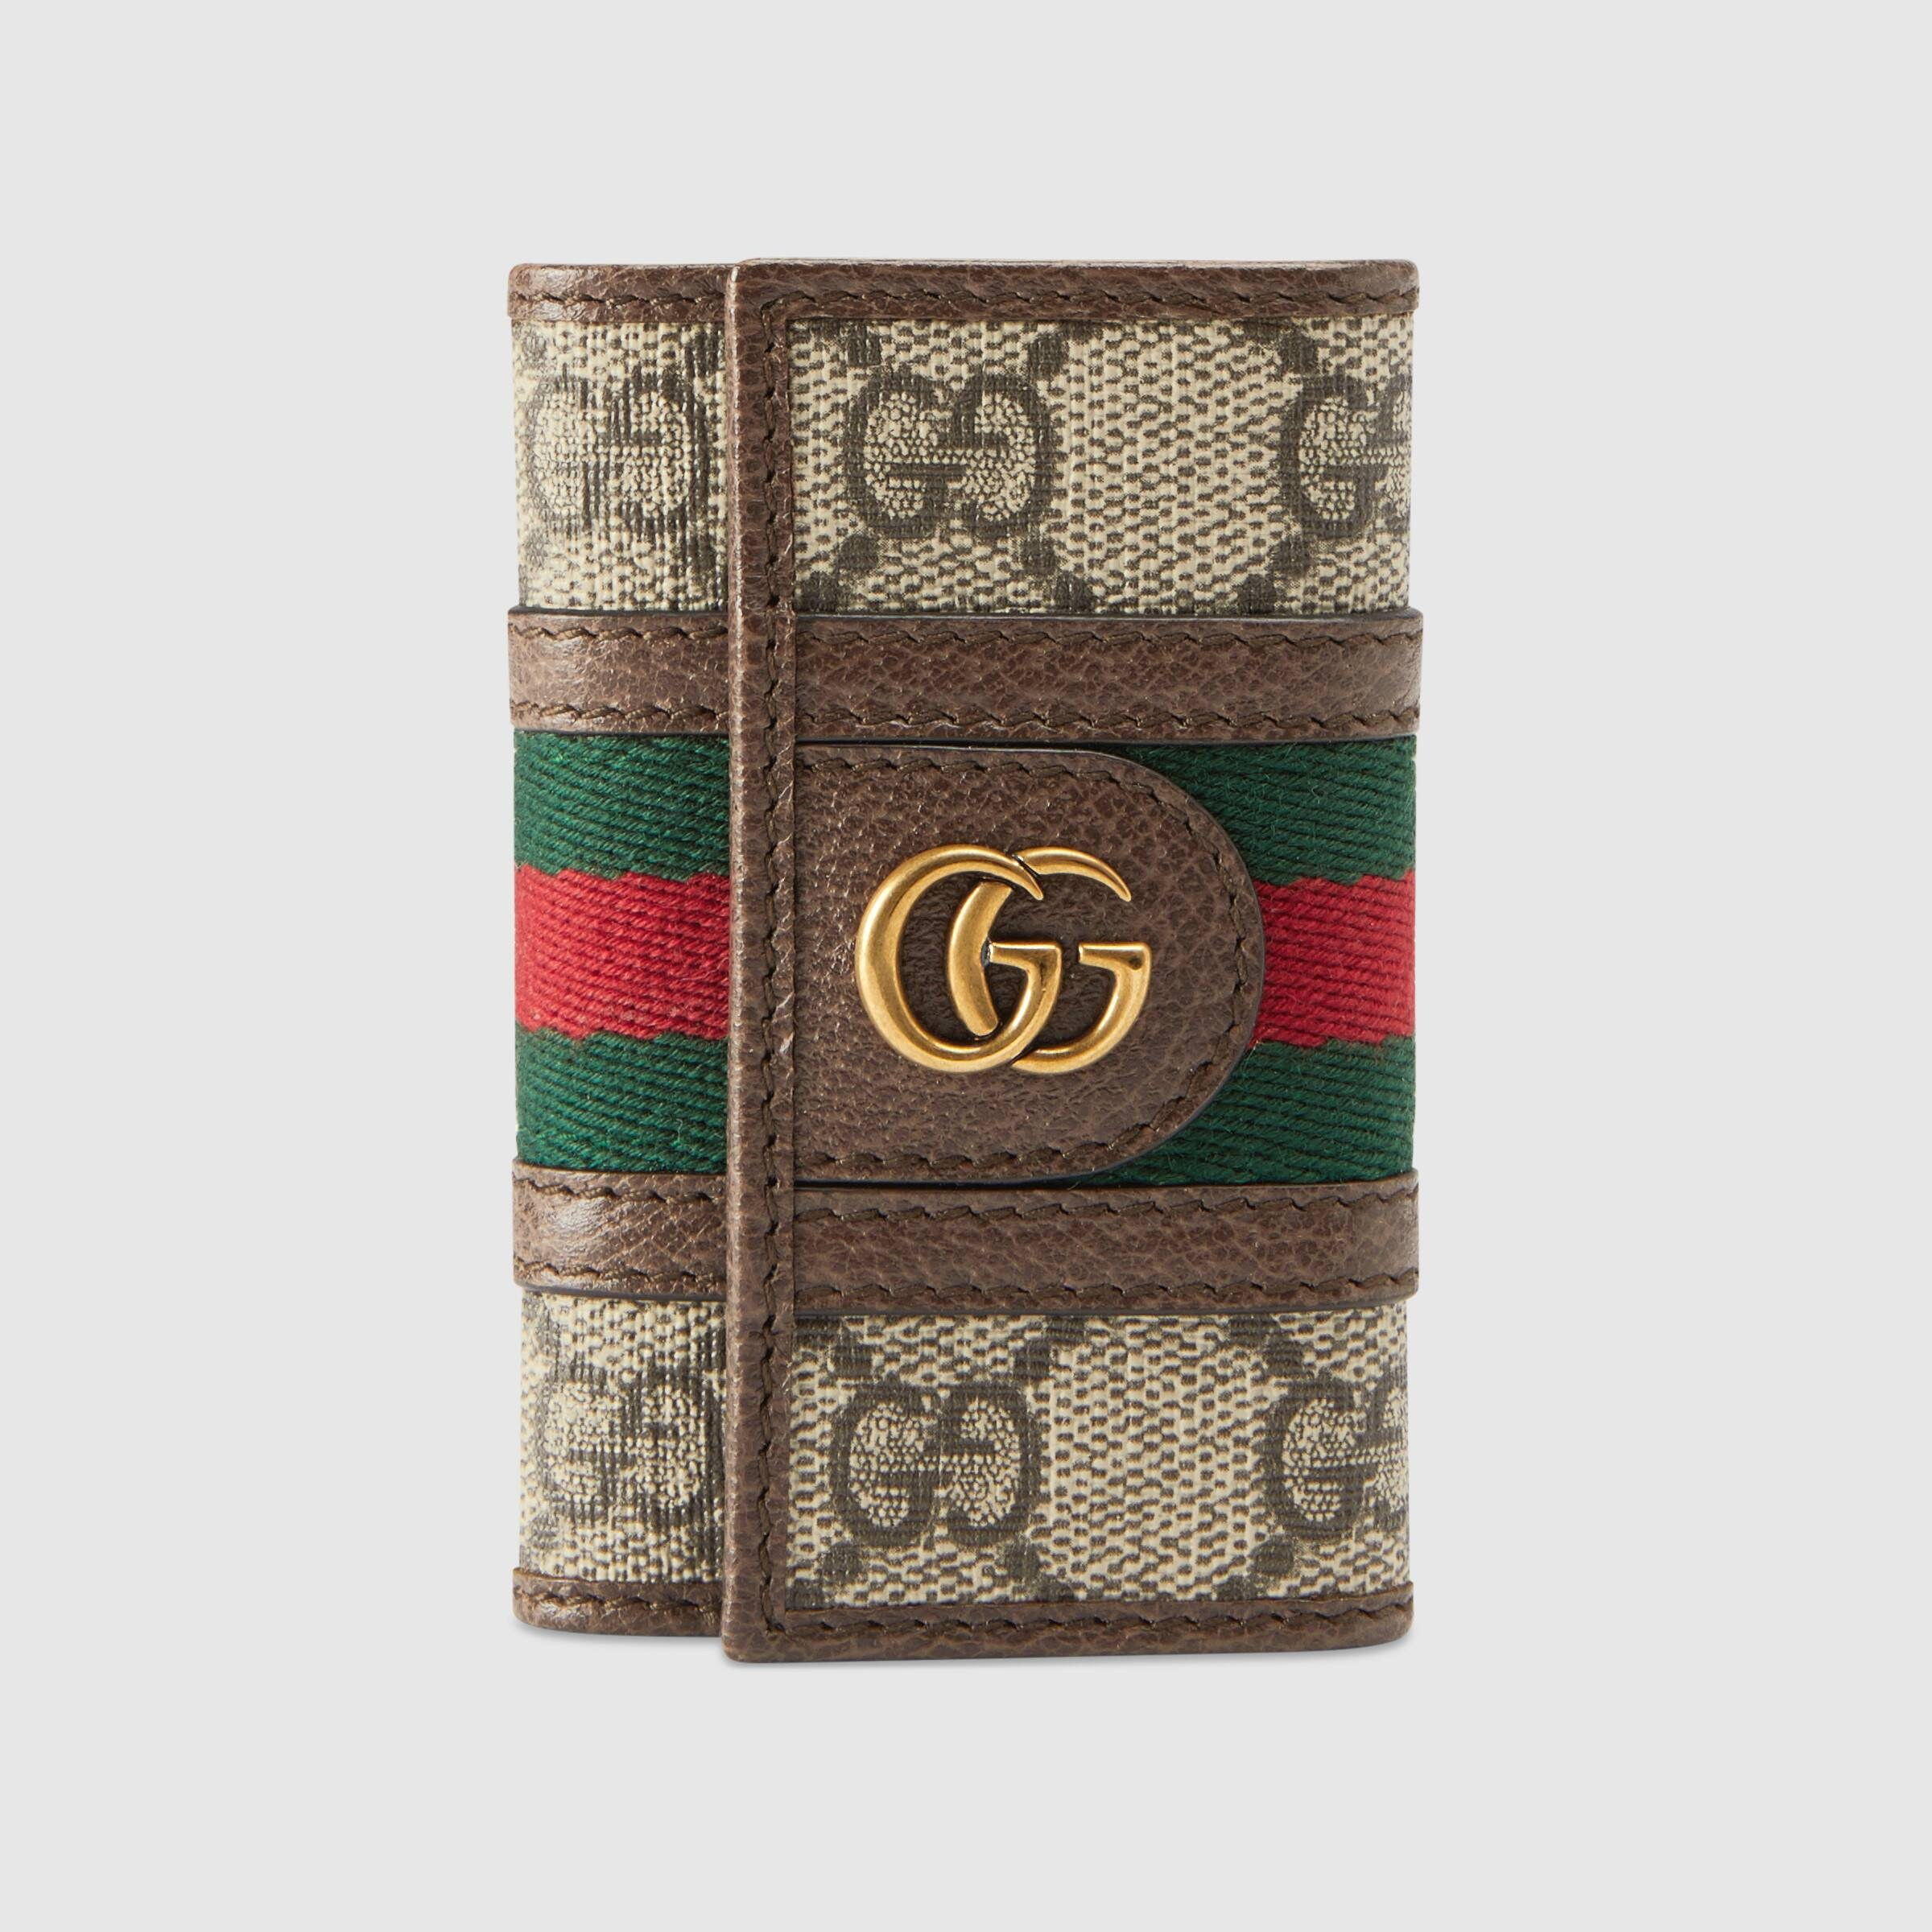 Gucci Ophidia GG key case 603732 96IWT 8745